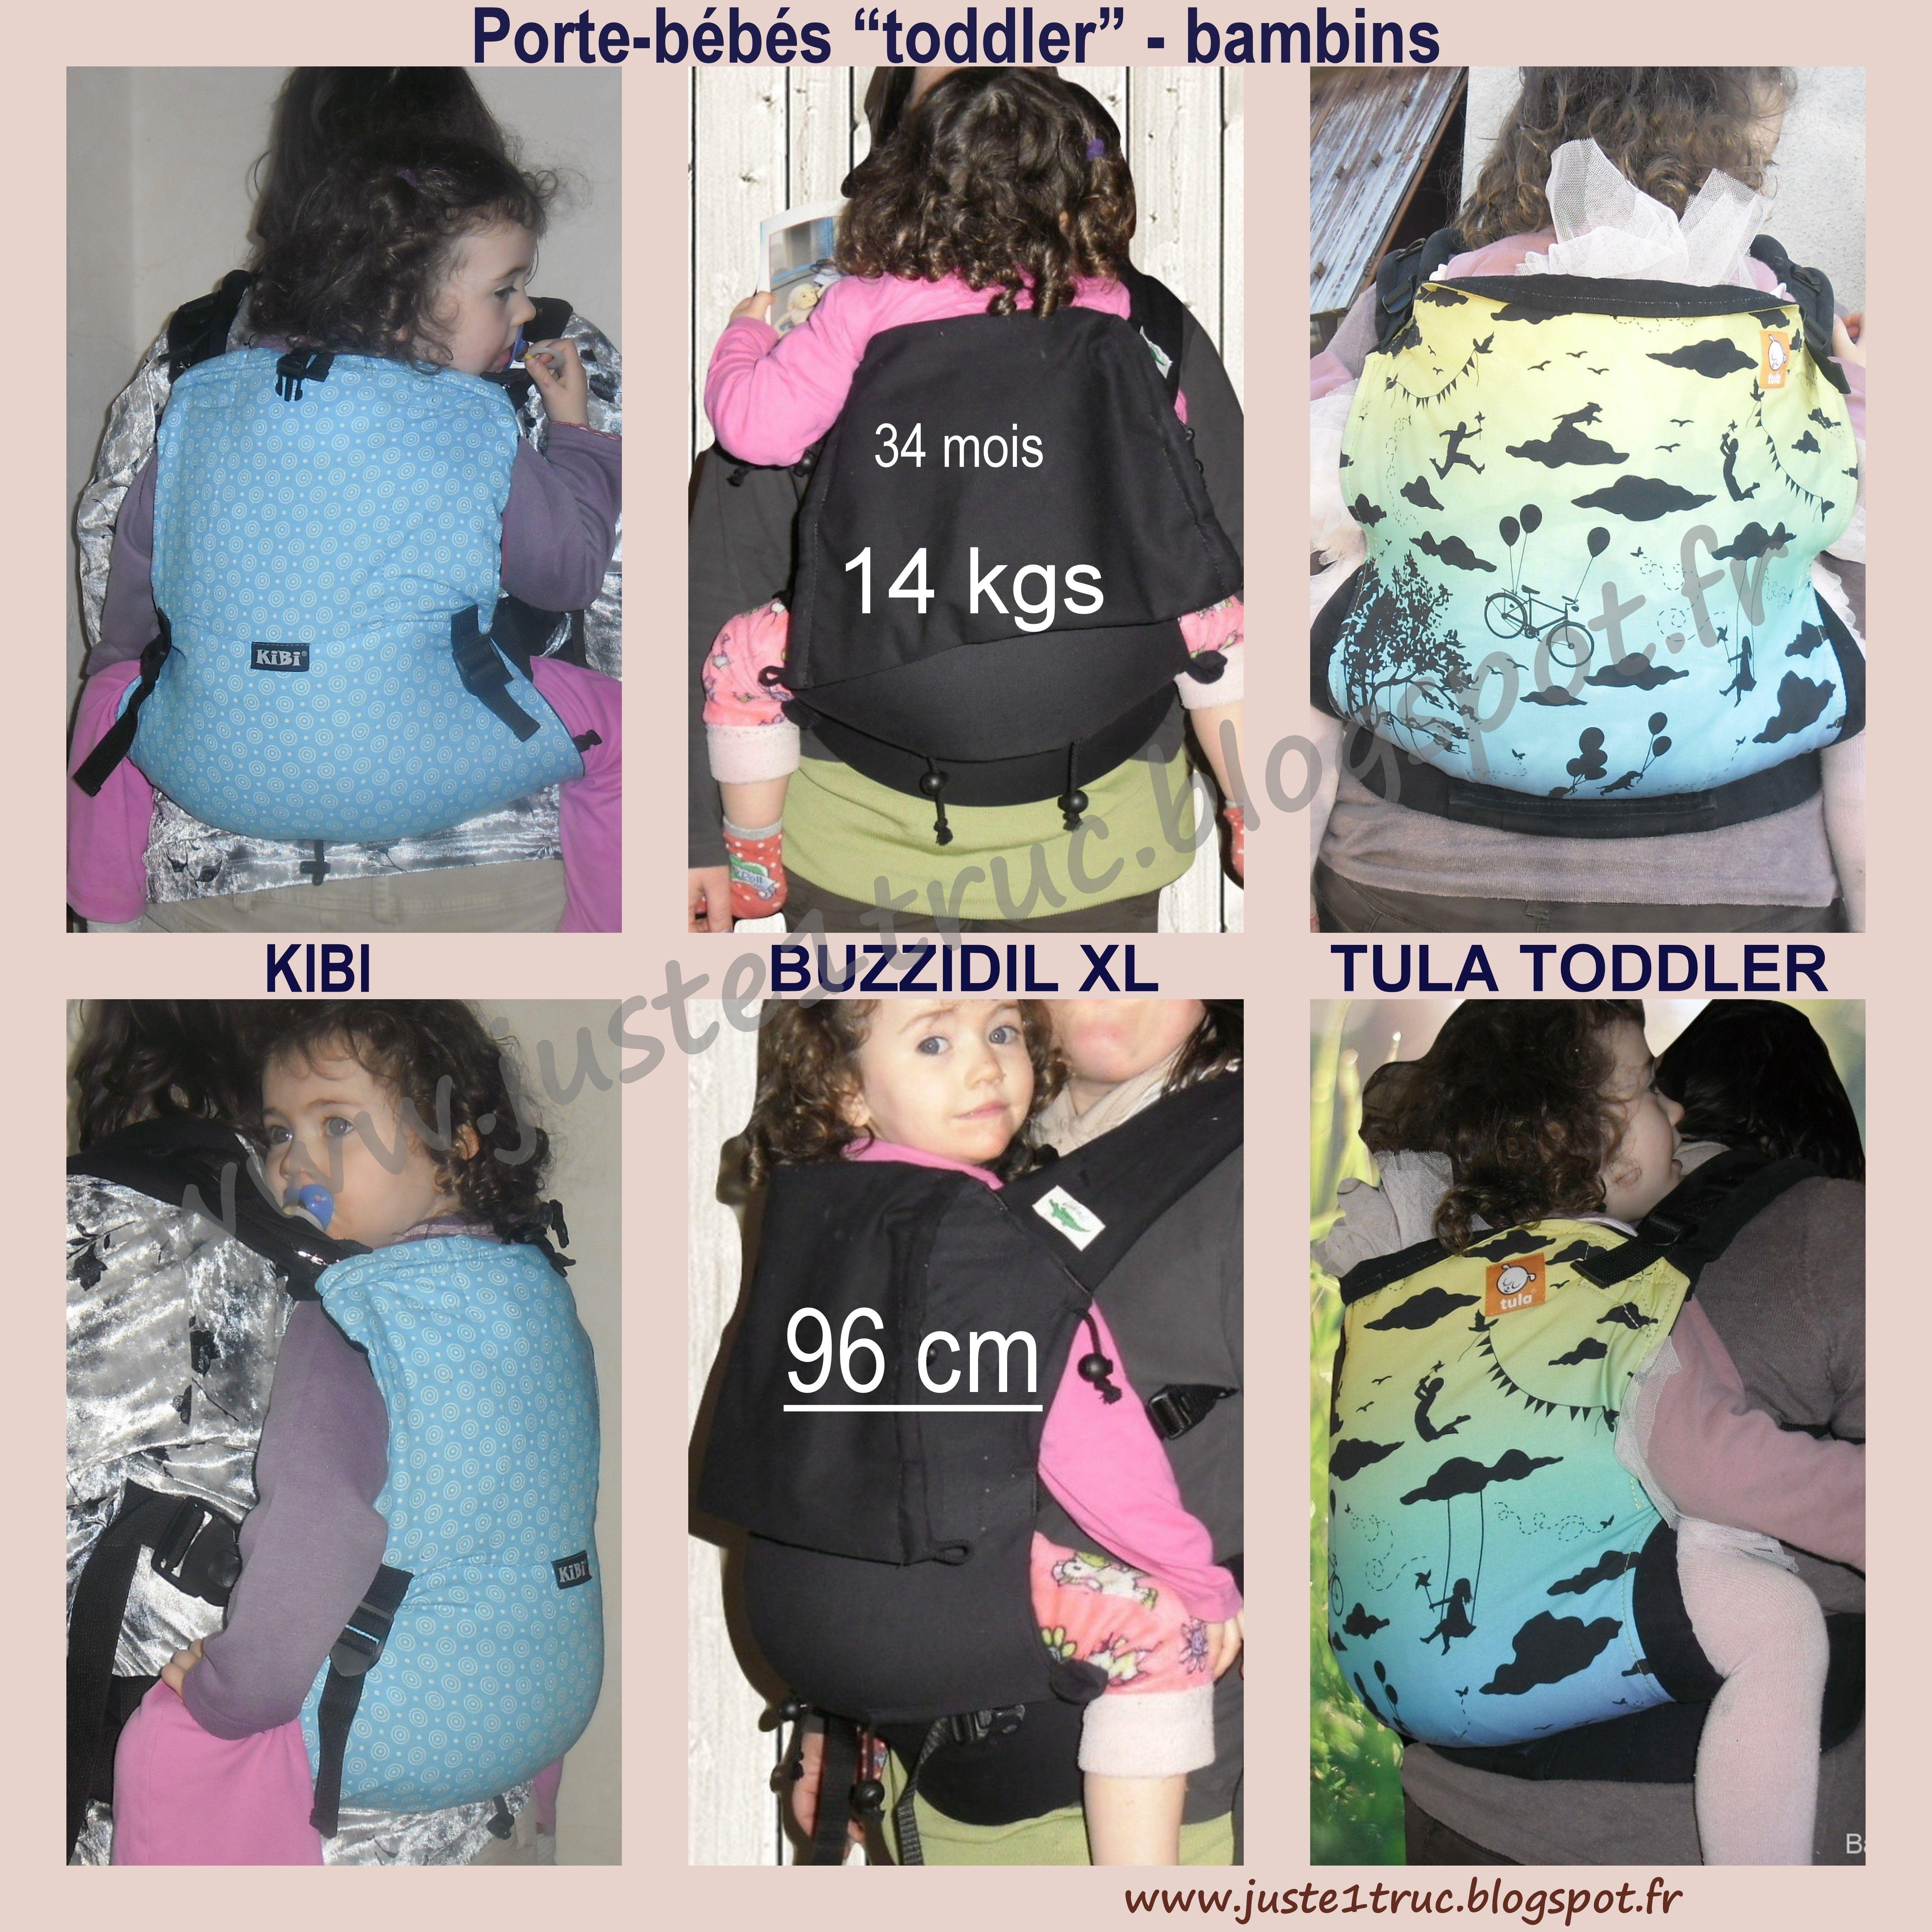 KIBI Buzzidil XL Tula Toddler babycarrier préformés bambins Portage  babywearing e5ef8bdb2b1